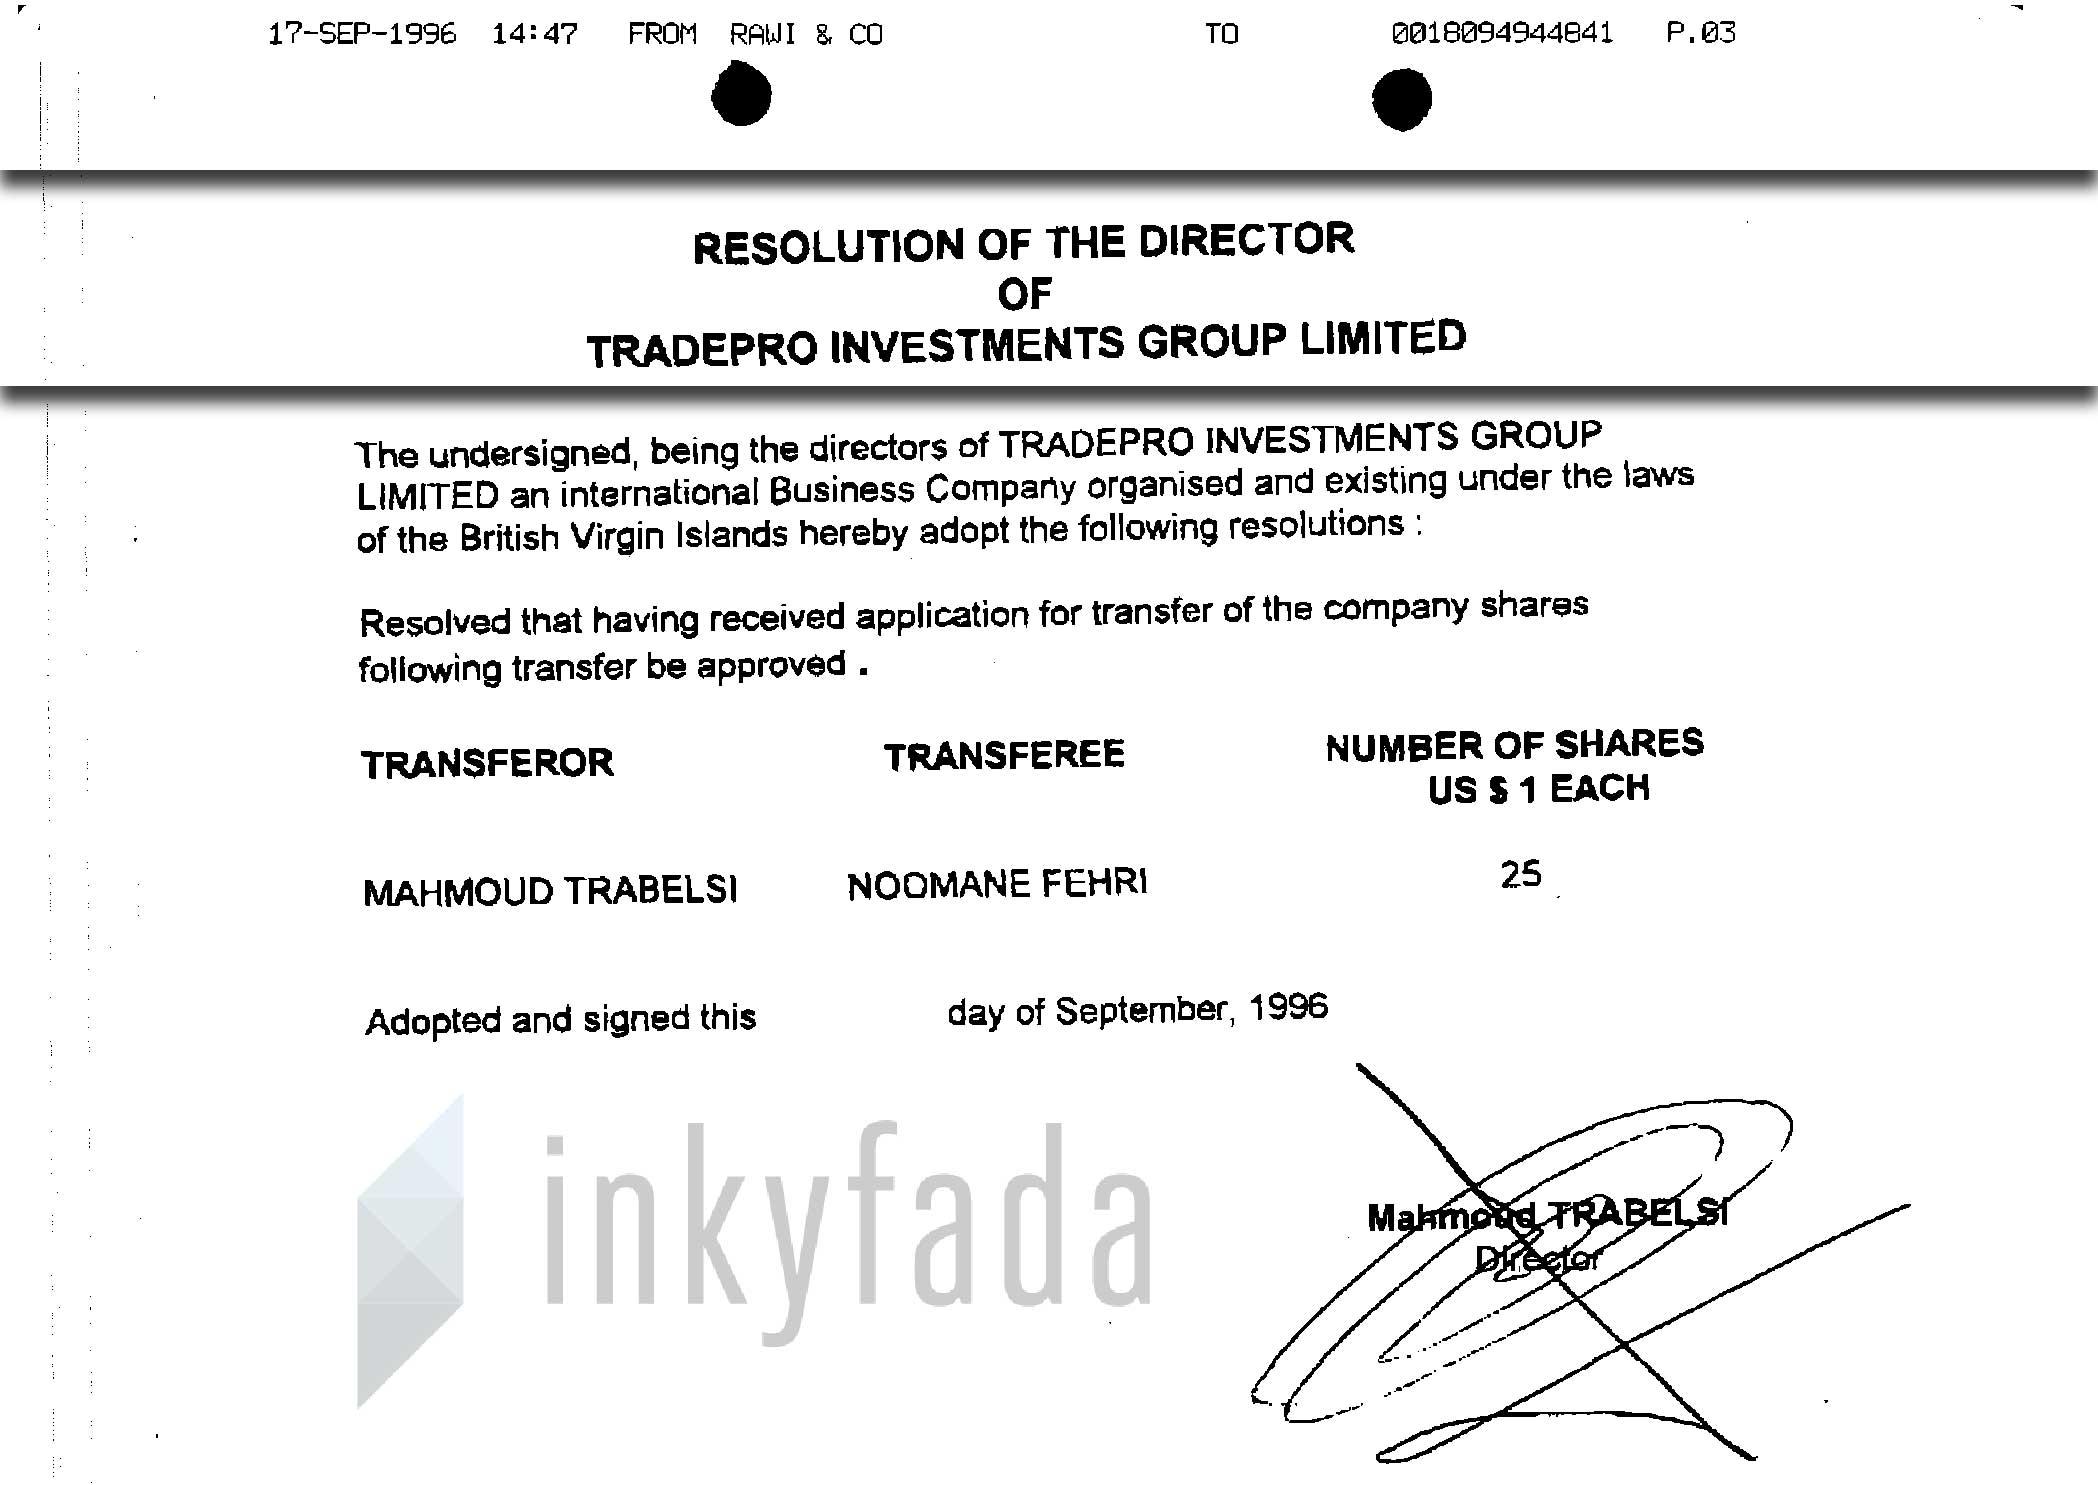 panamapapers-nooman-fehri-tradepro-information-system-minutes-directeurs-shaires-inkyfada